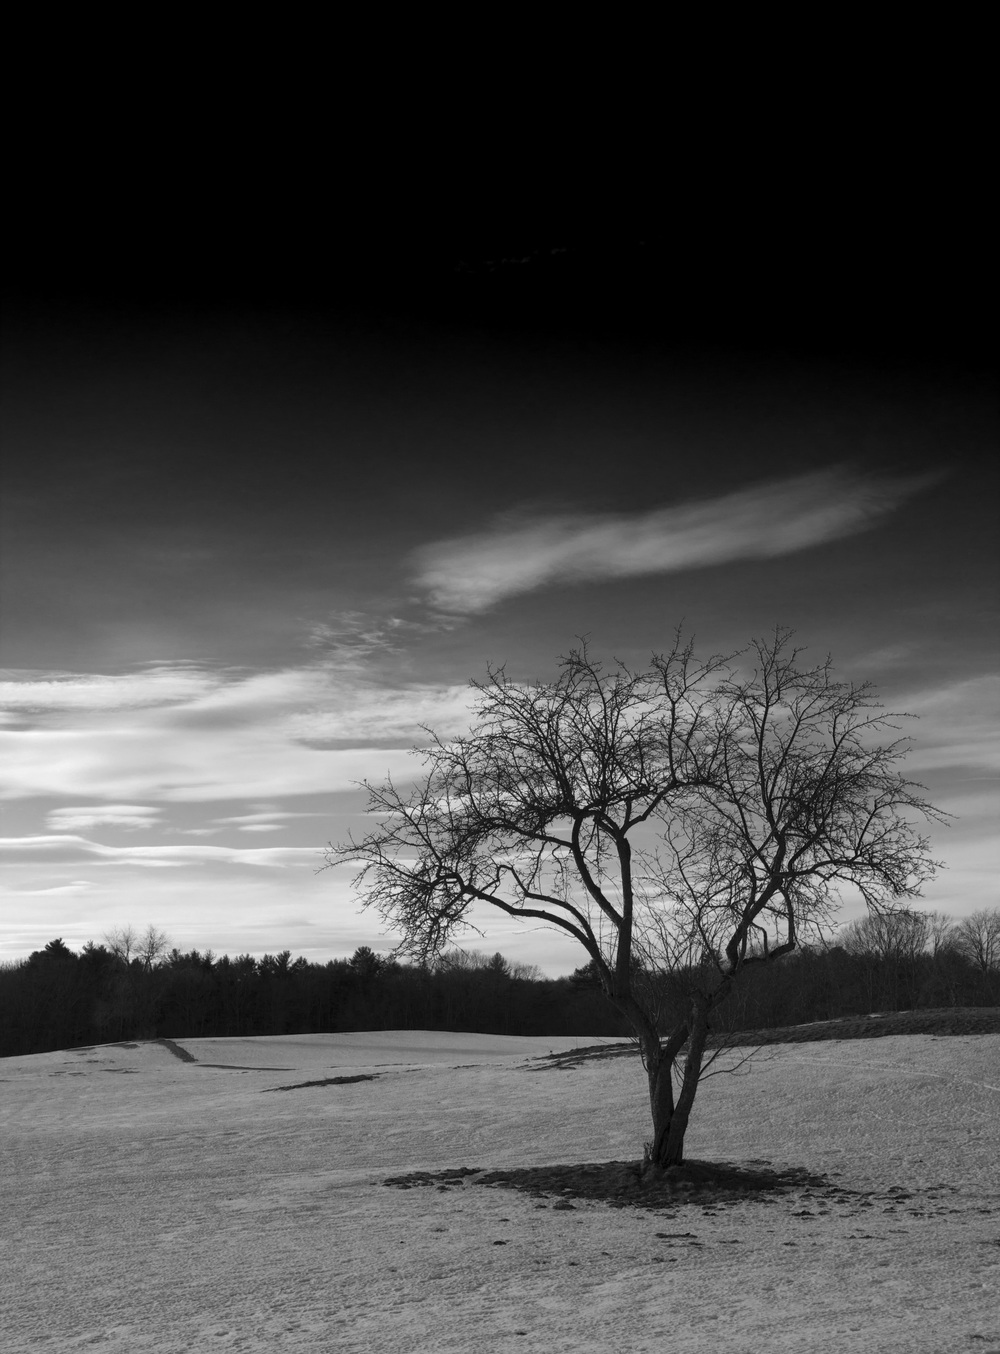 Tree_2IMG_1180BW.jpg